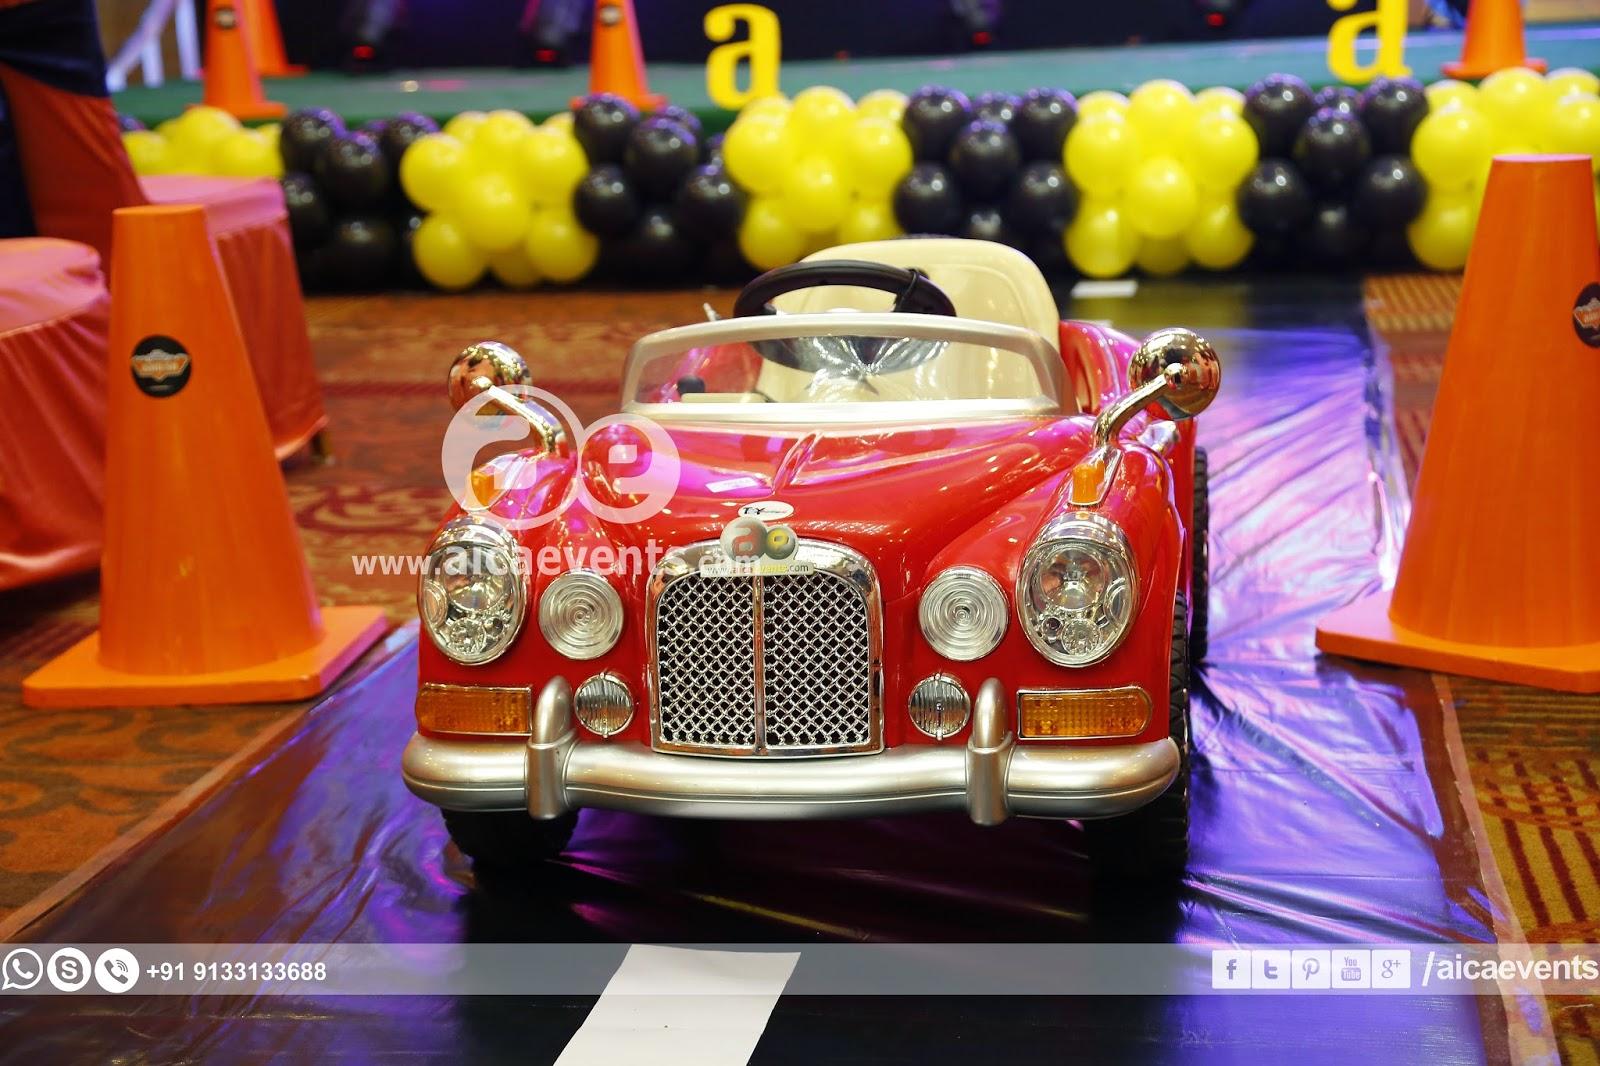 Disney Cars Theme India Party Supplies Themes